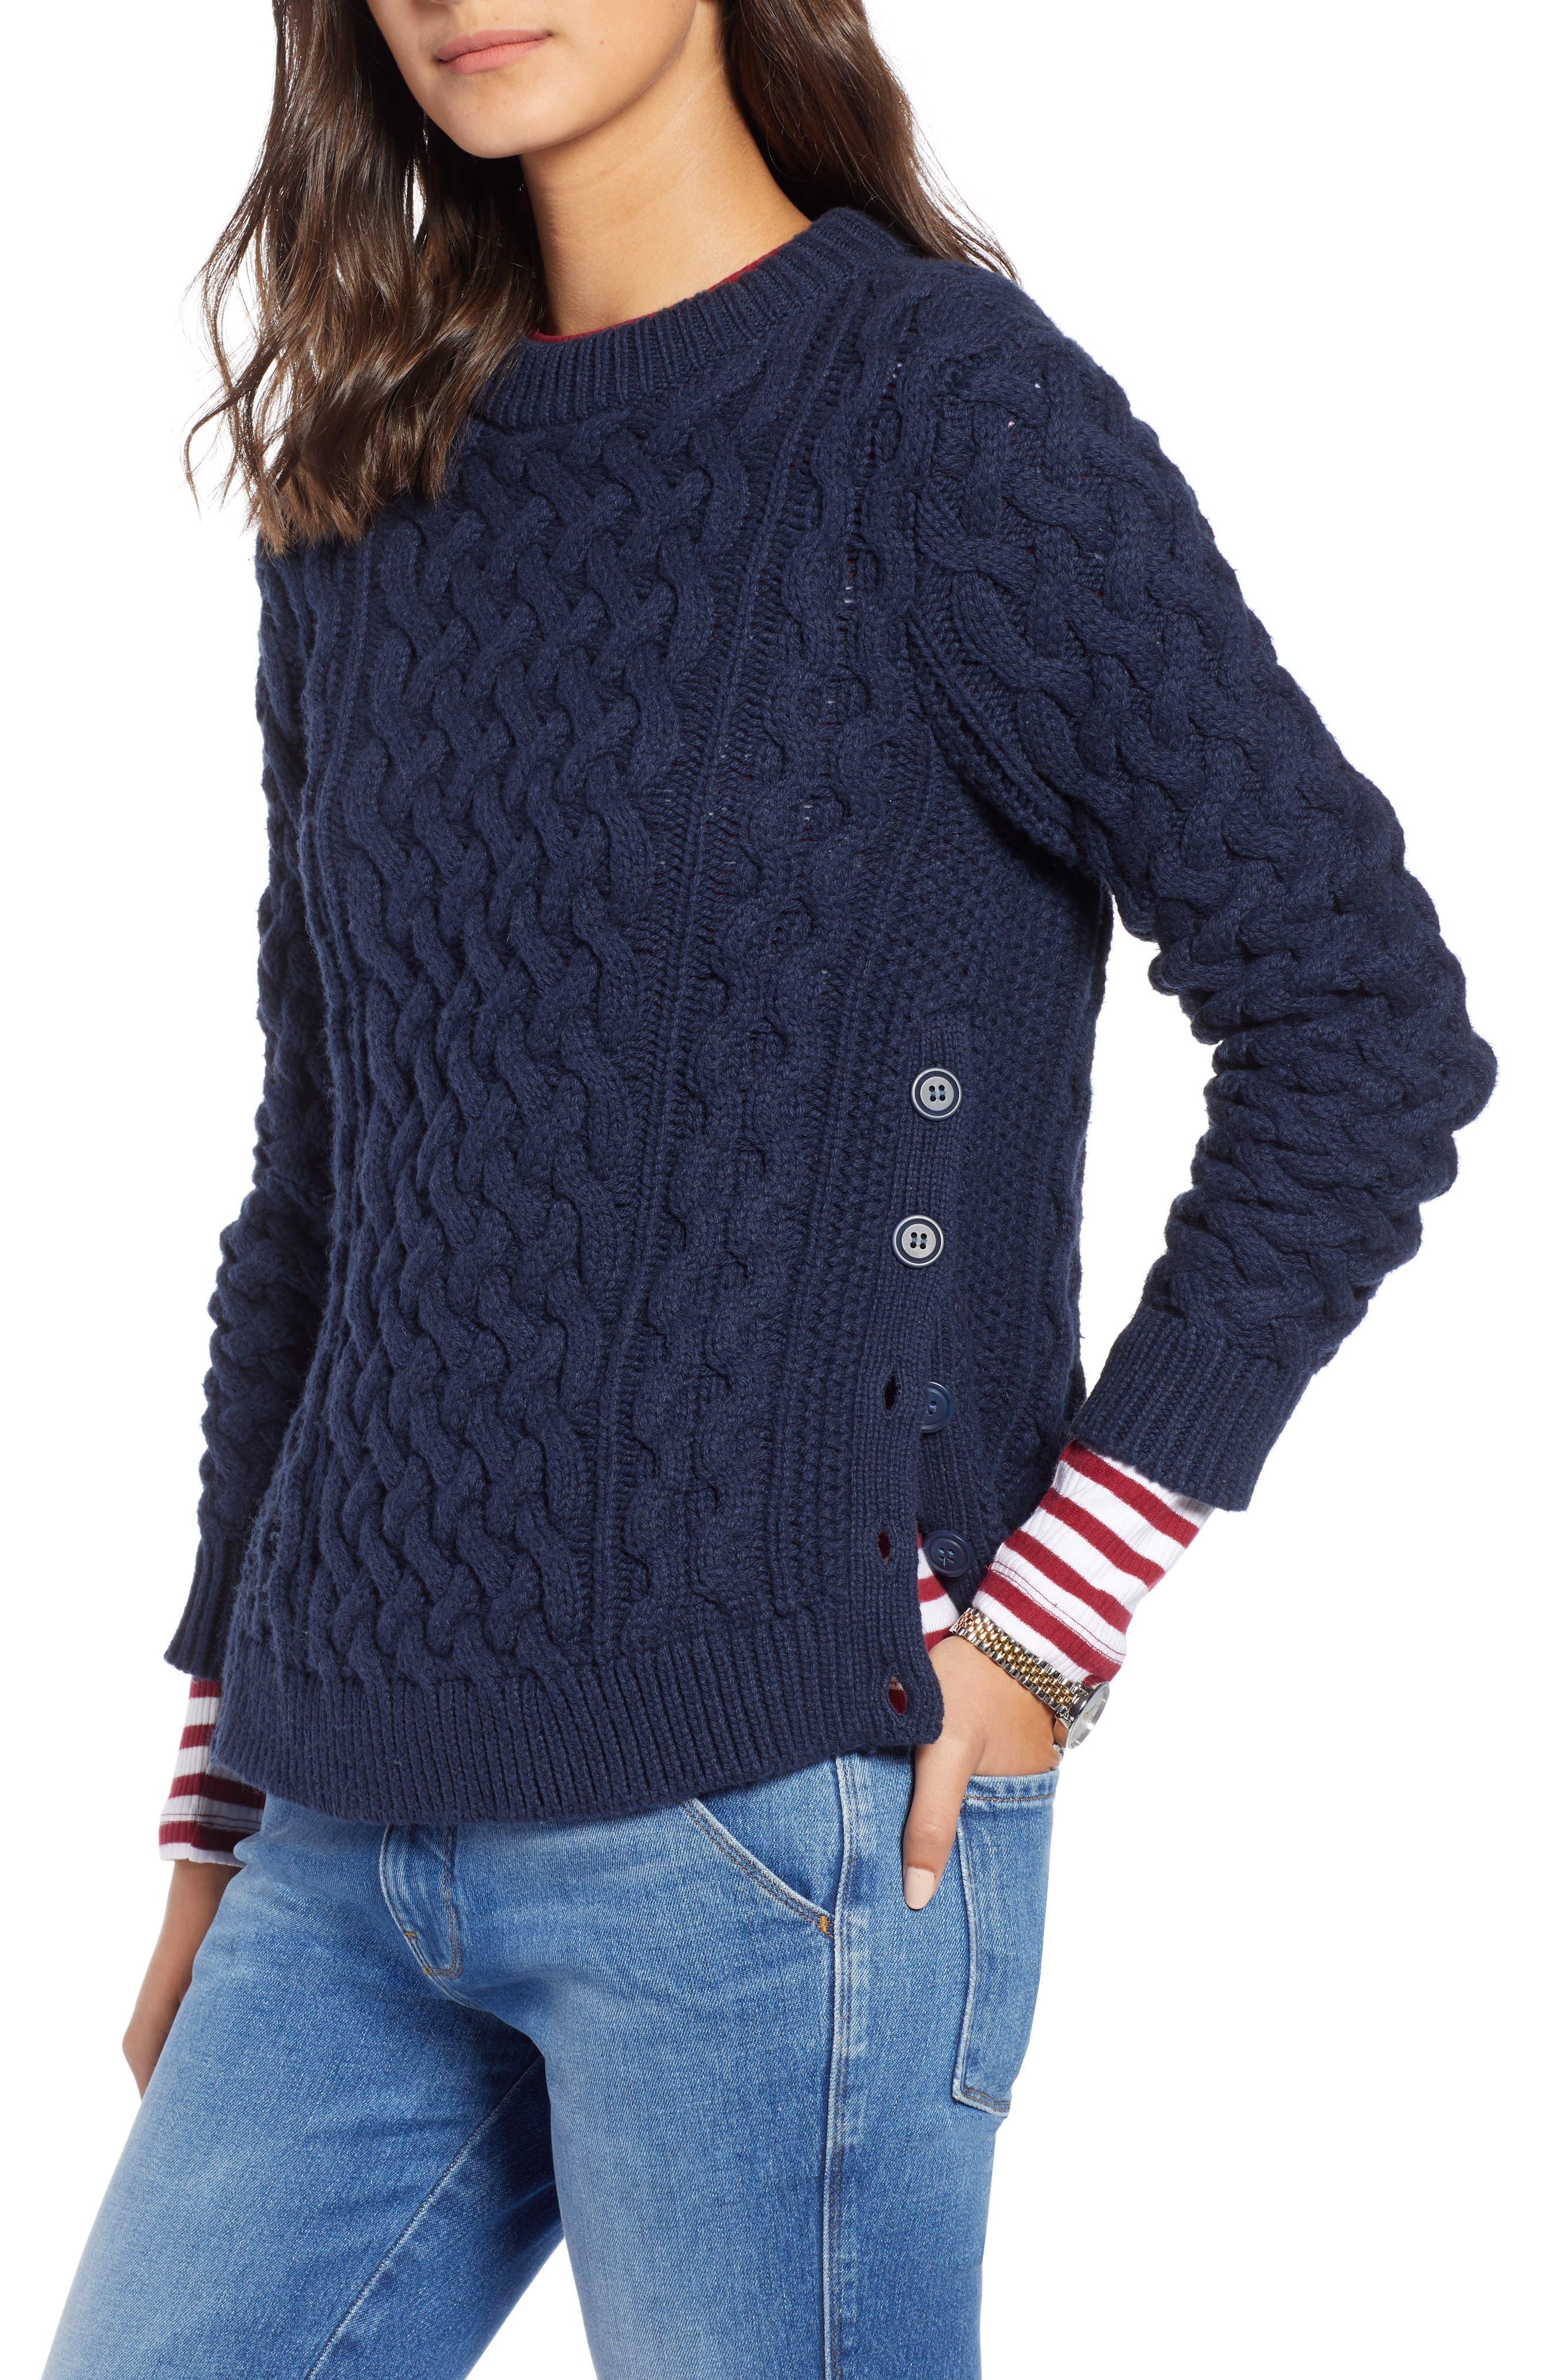 Fisherwoman Crewneck Pullover Sweater,                         Main,                         color, NAVY BLAZER